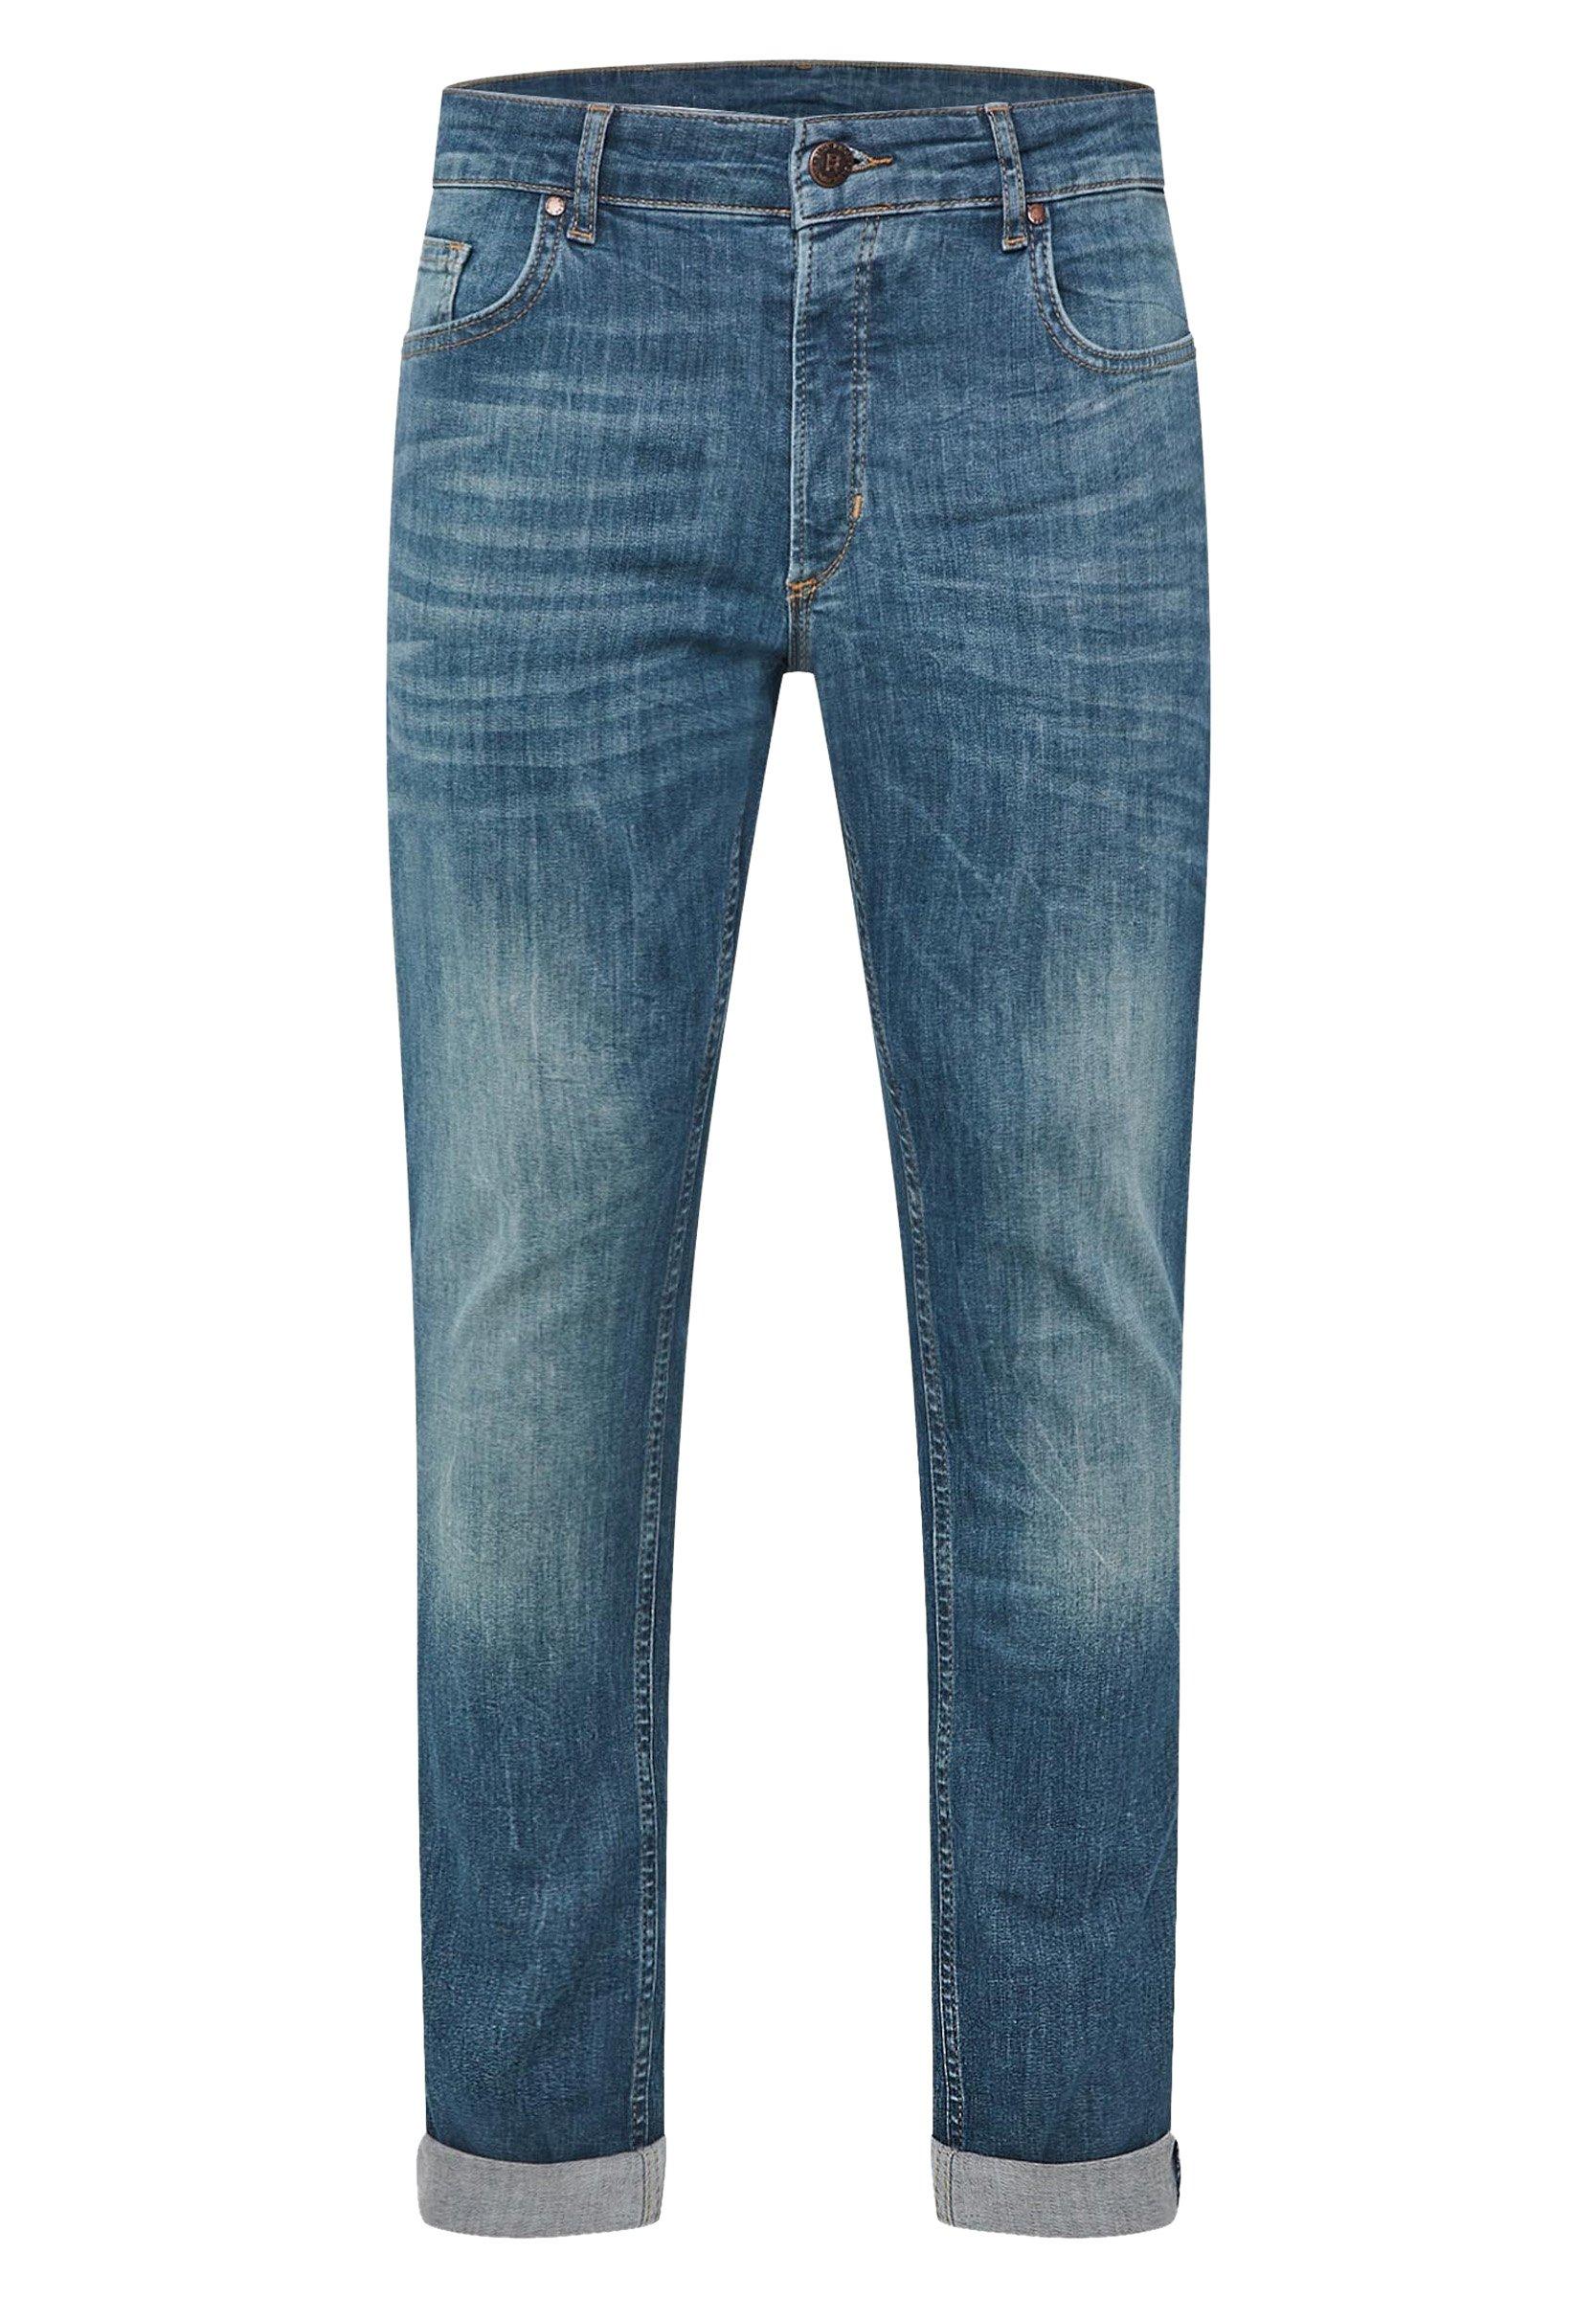 WE Fashion Slim fit jeans - blue